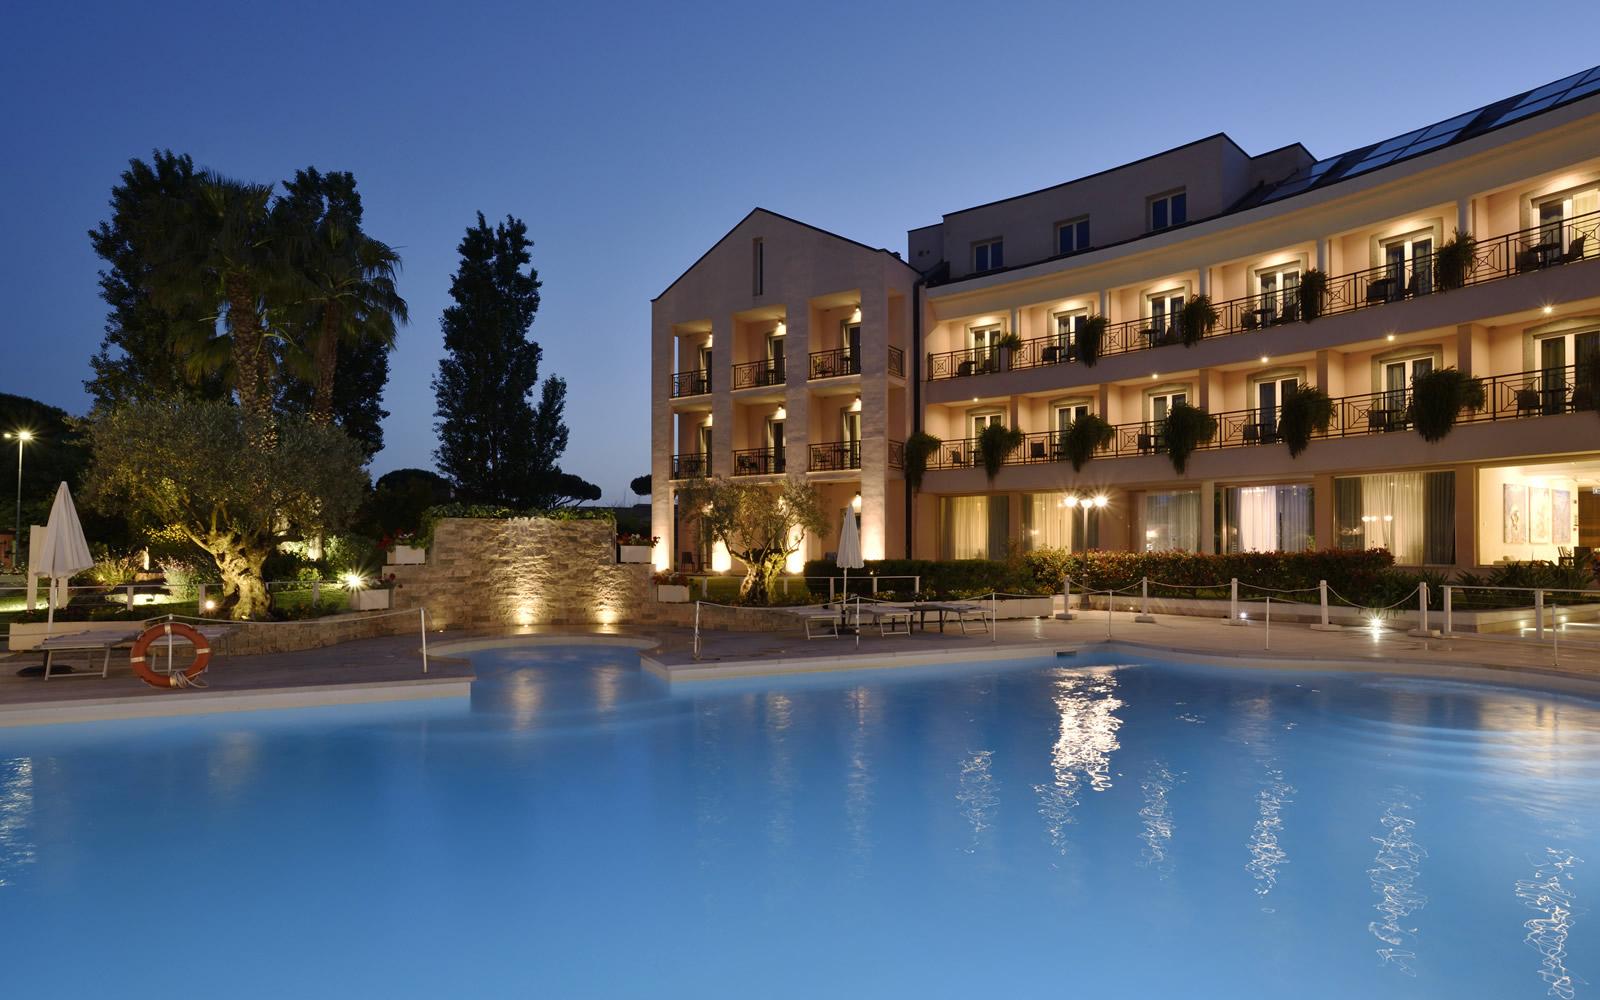 Hotel Isola Sacra Rome Airport - Hôtel Avec Piscine encequiconcerne Hotel Rome Avec Piscine